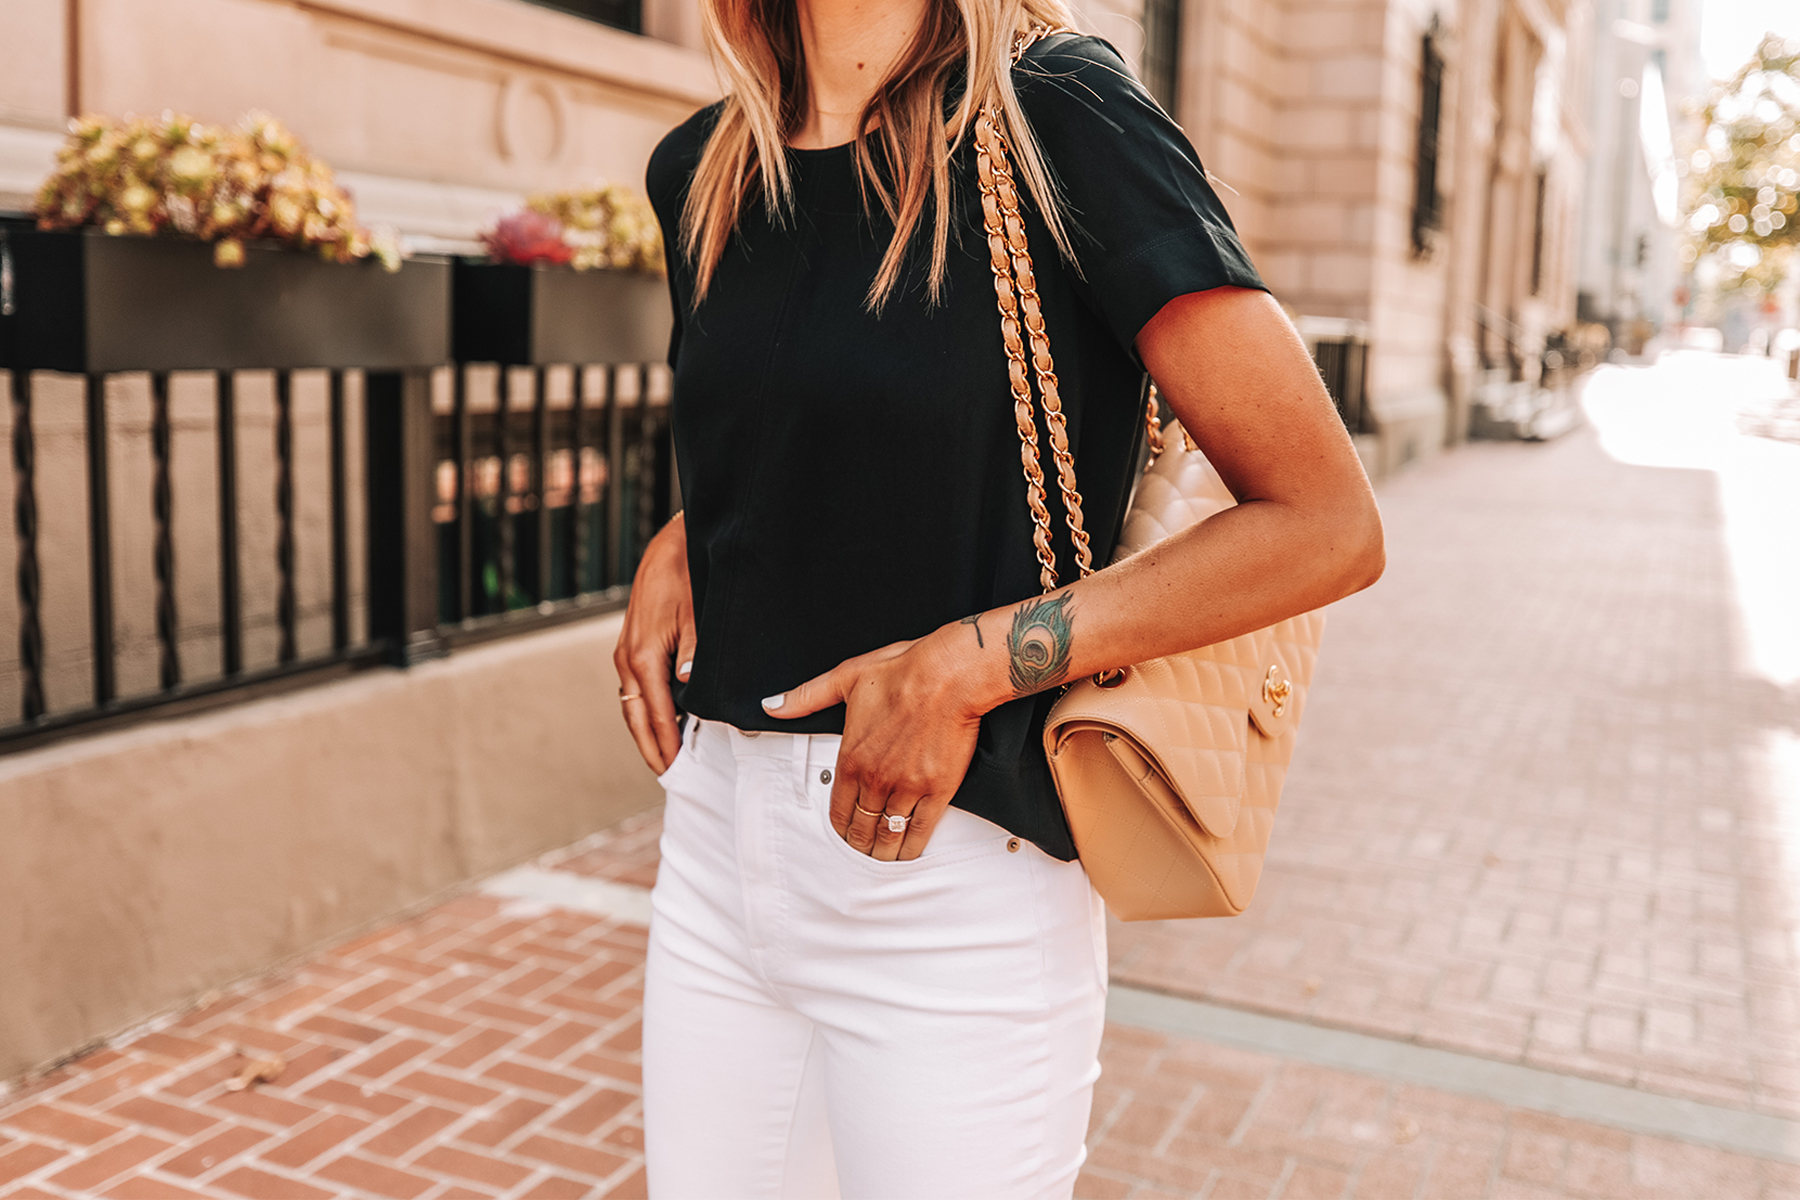 Fahsion Jackson Wearing Everlane Black Short Sleeve Top White High Rise Jeans Chanel Beige Handbag